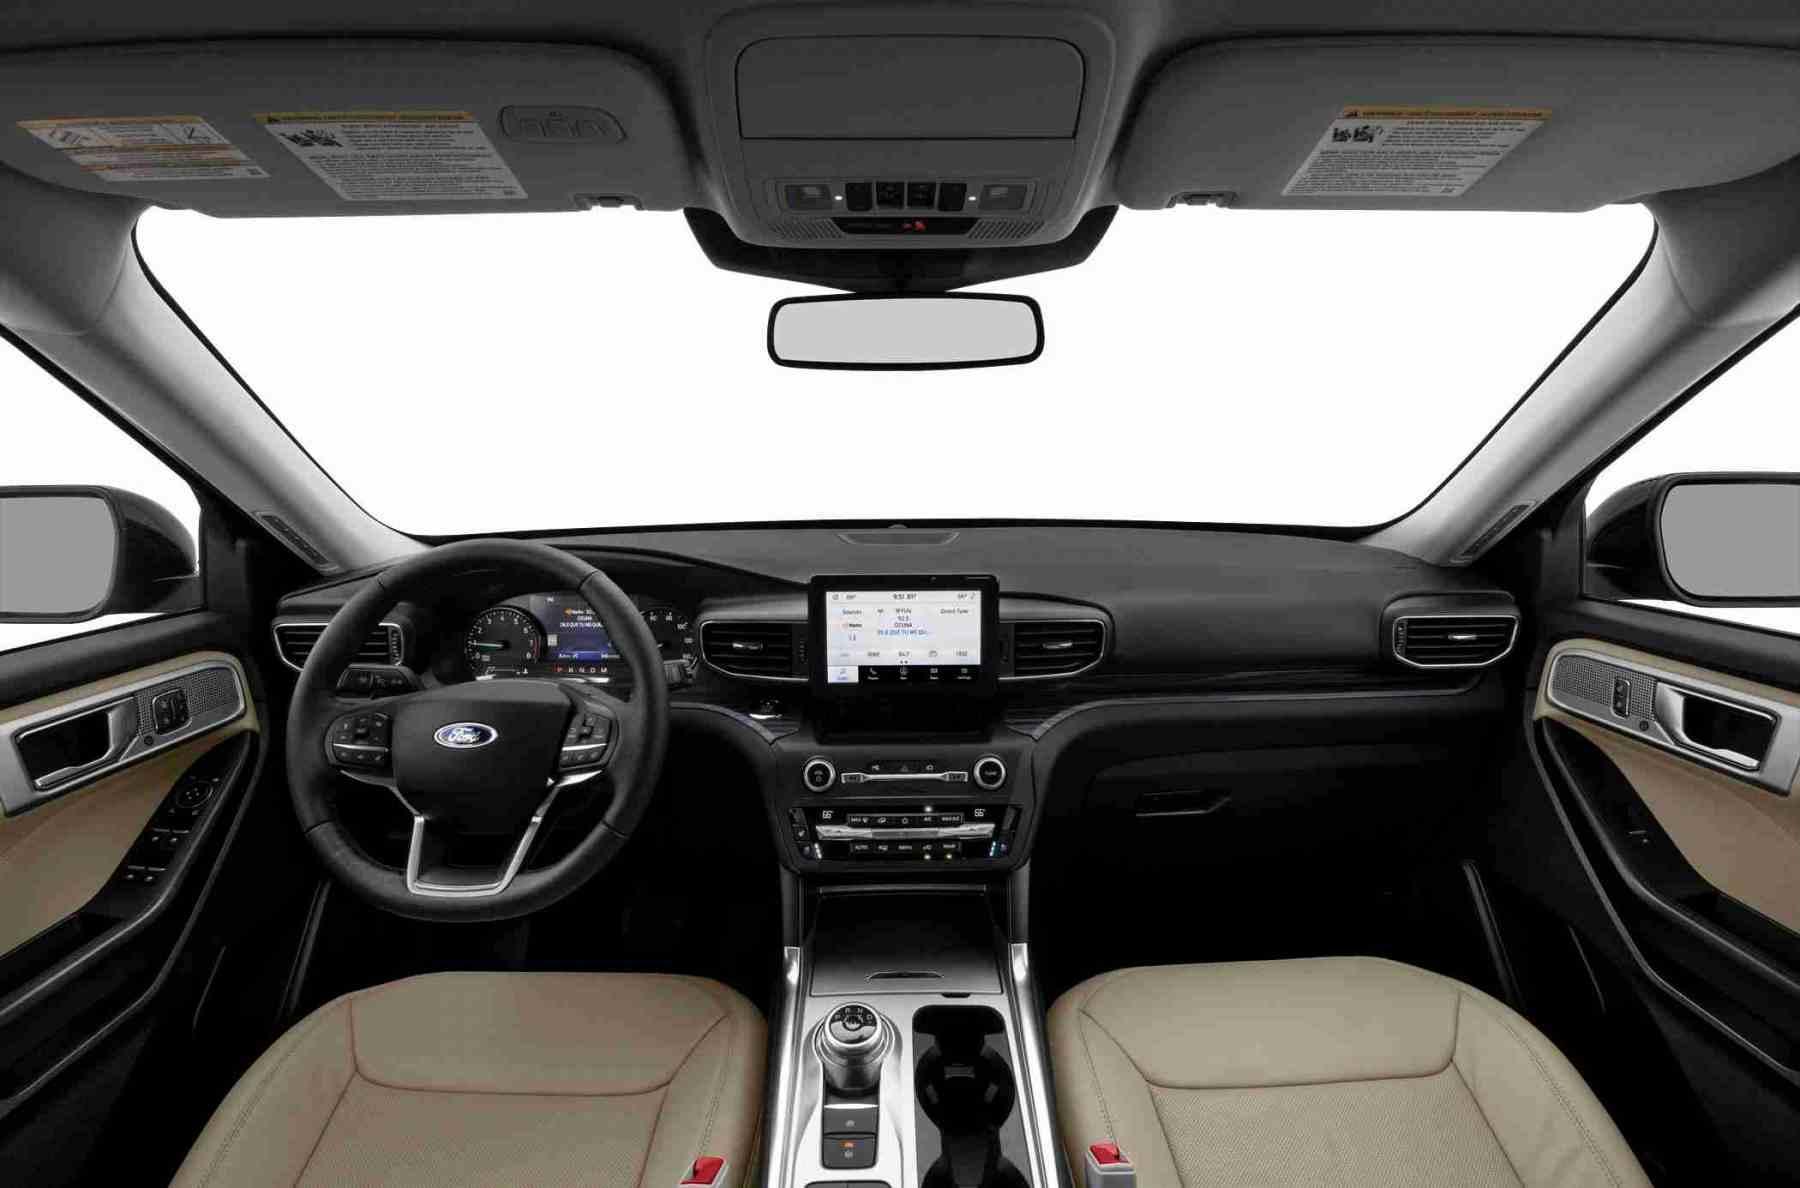 2020-ford-explorer-interior